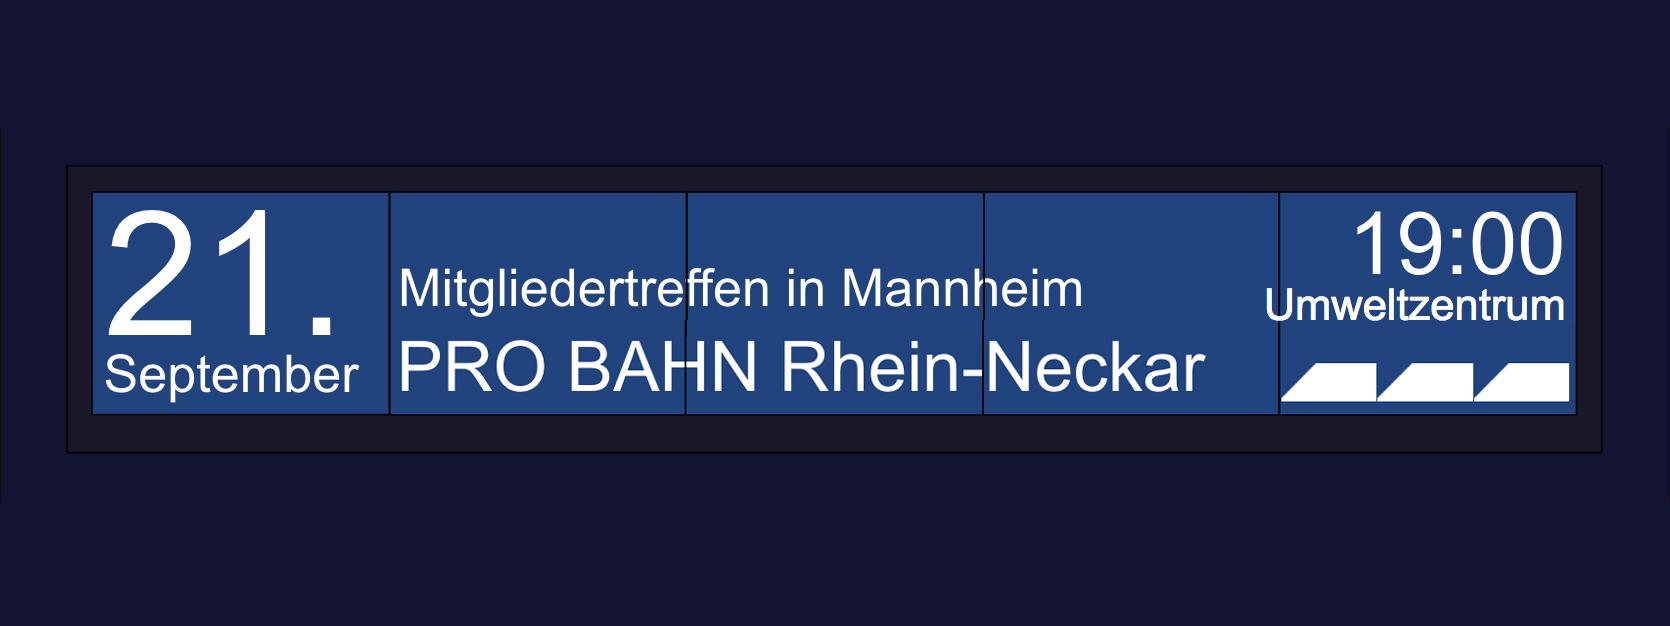 PRO BAHN Rhein-Neckar